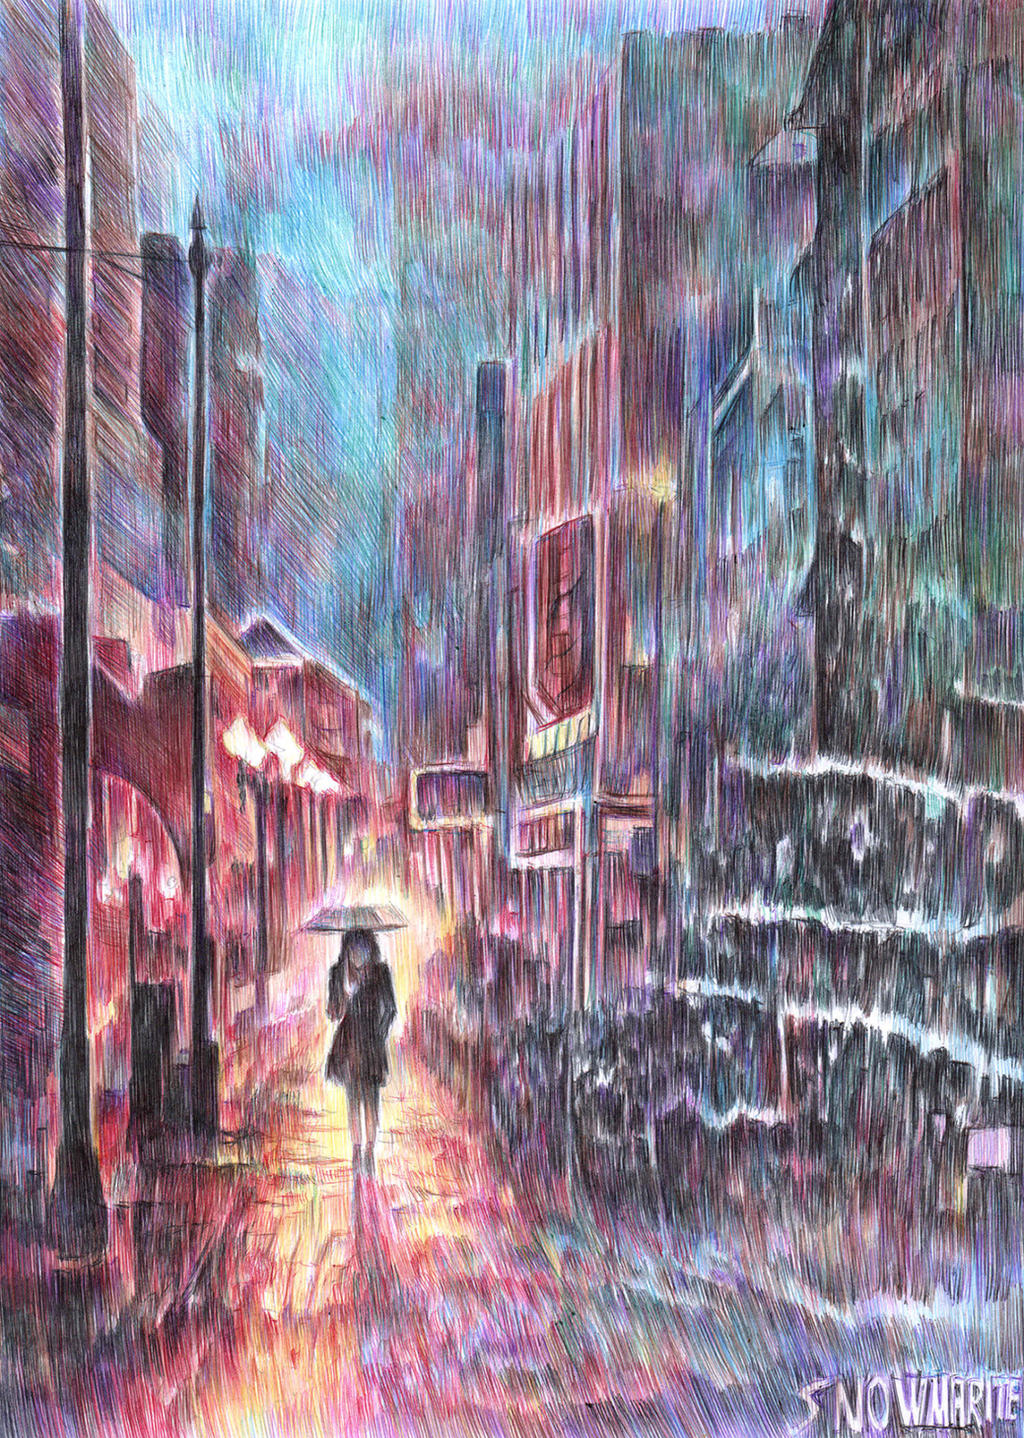 Take a Walk by snowmarite